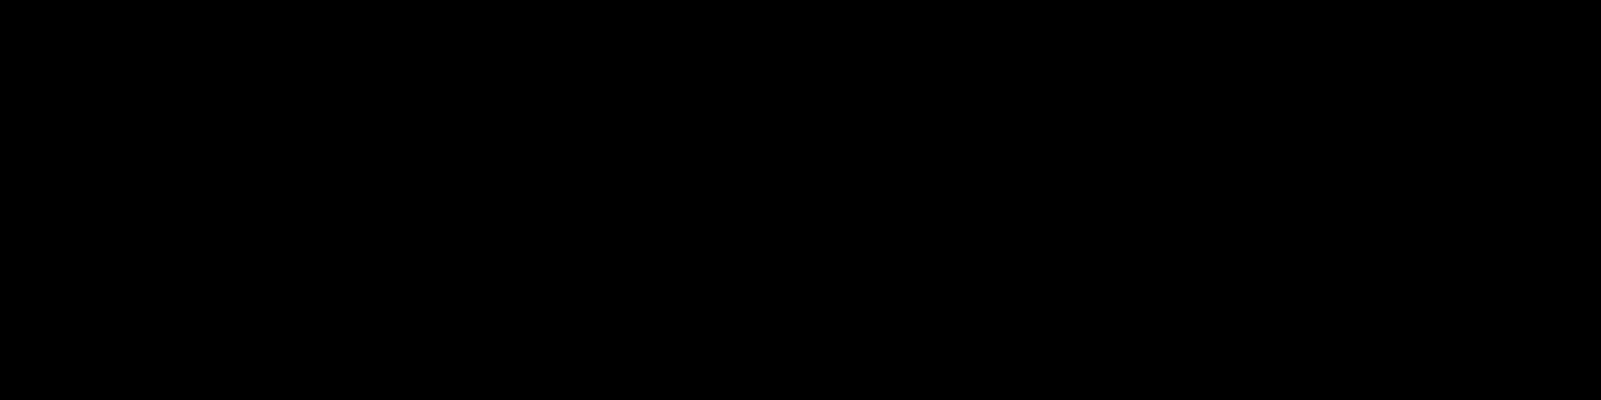 Playa Vista Equities logo